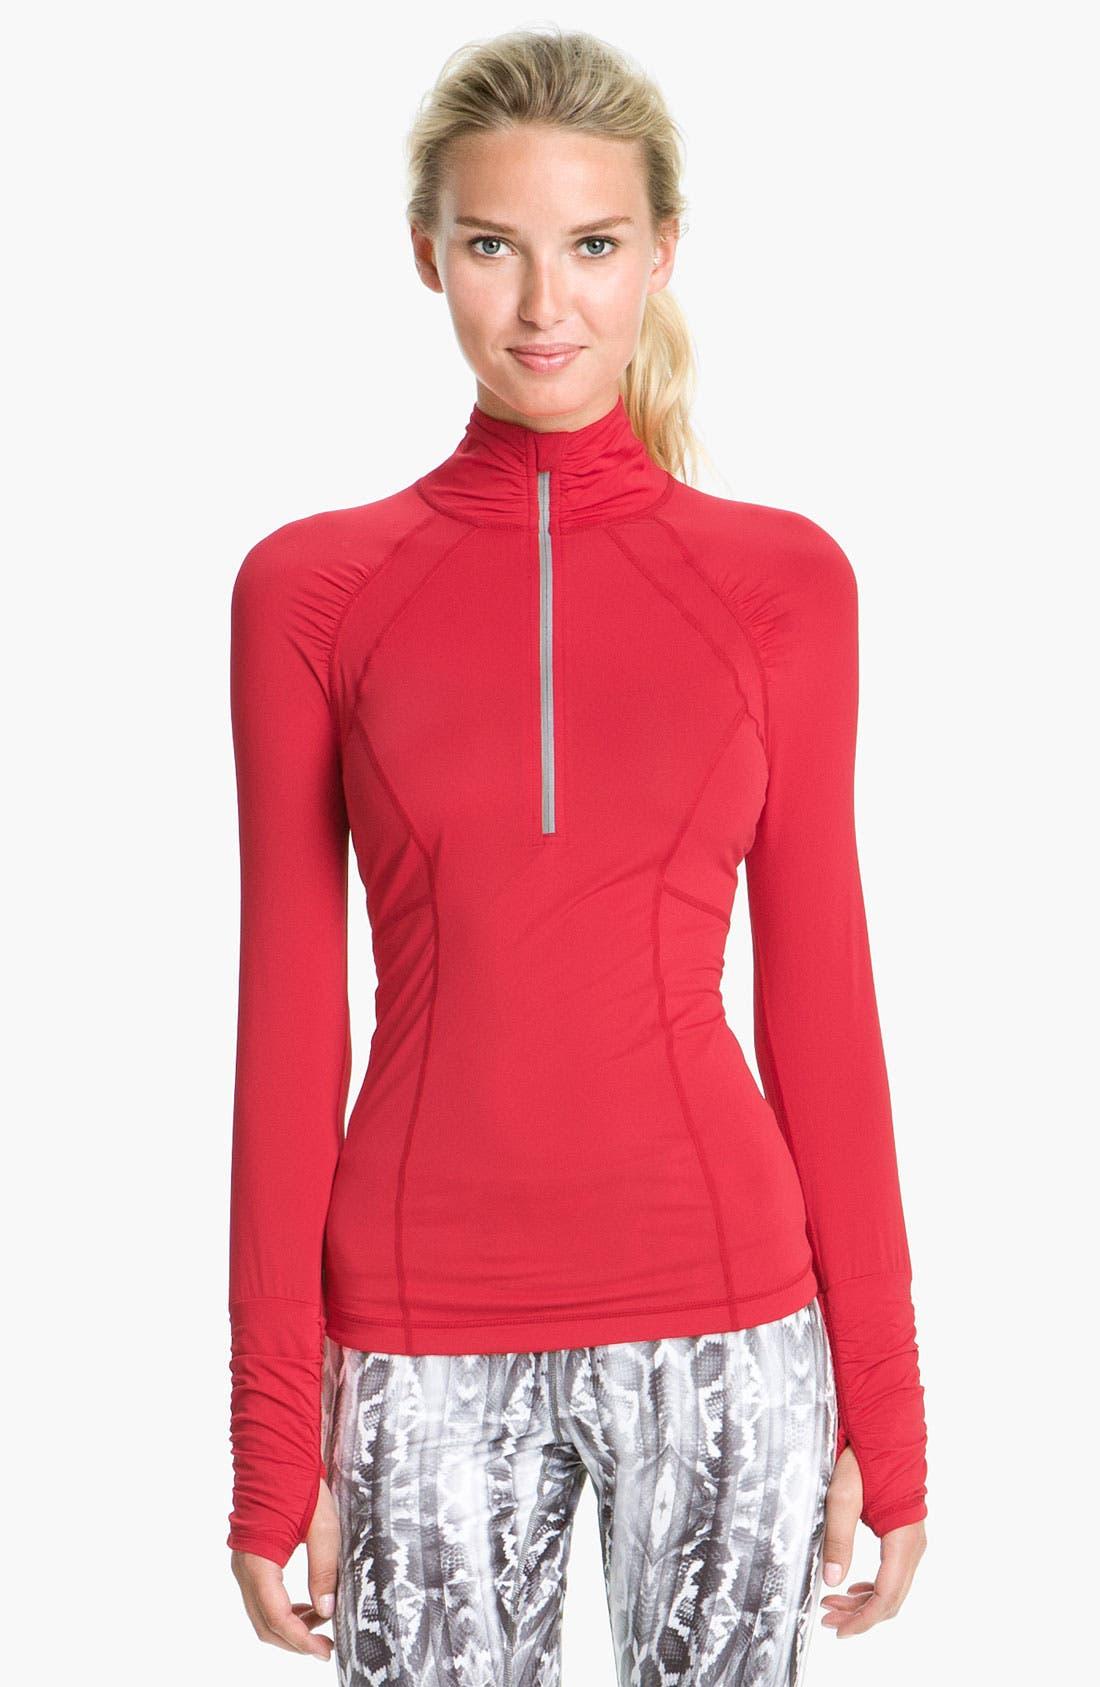 Main Image - Zella 'Micro Jersey' Half Zip Pullover